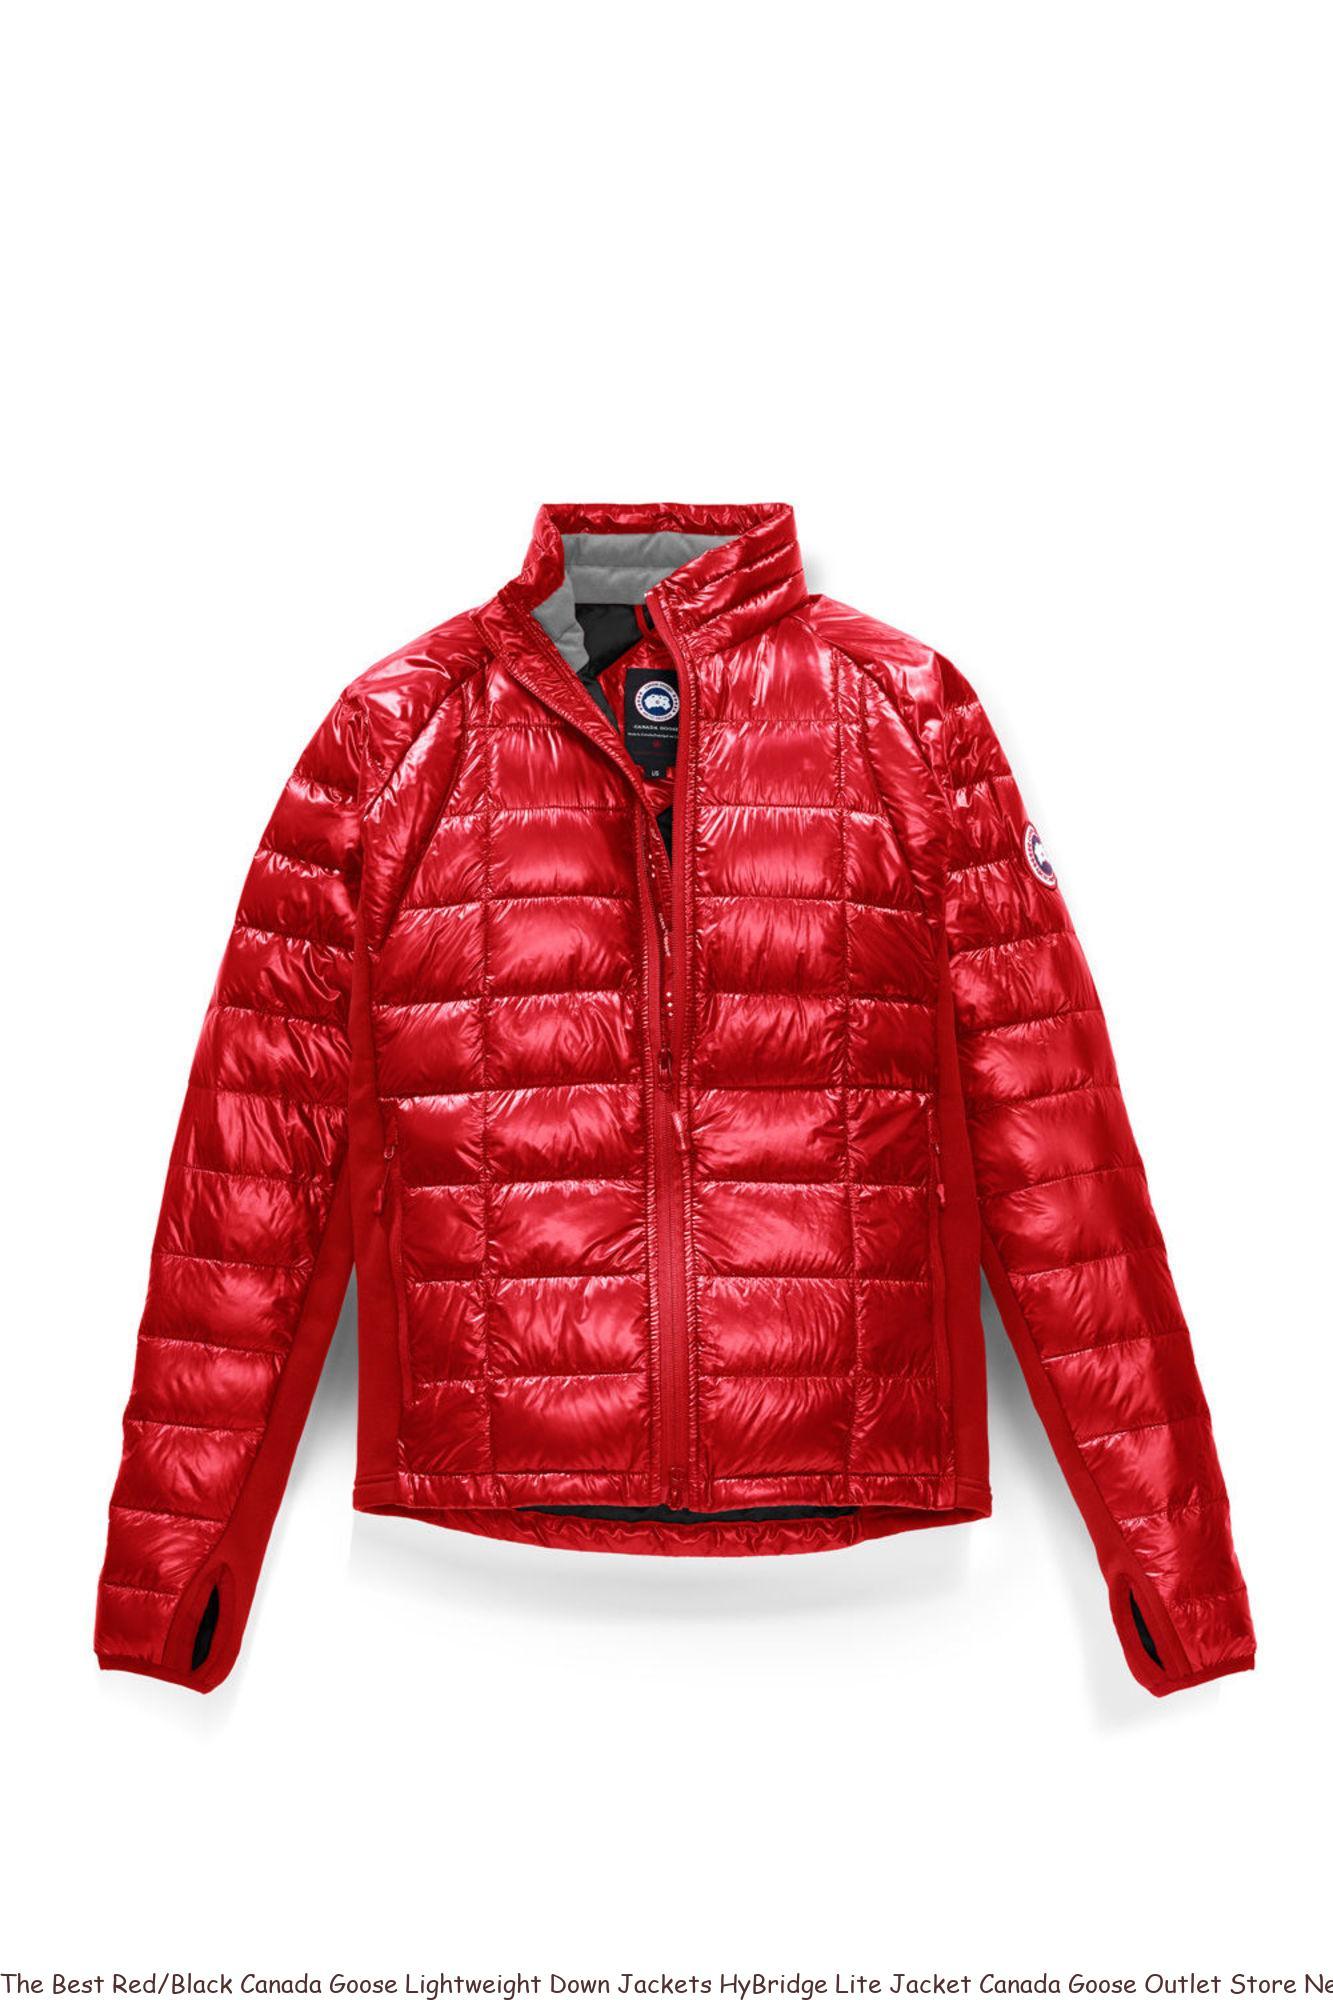 The Best Red/Black Canada Goose Lightweight Down Jackets HyBridge Lite  Jacket Canada Goose Outlet Store New York 2701M – UK Canada Goose Outlet  Sale – 209 Official Canada Goose Outlet Black Friday